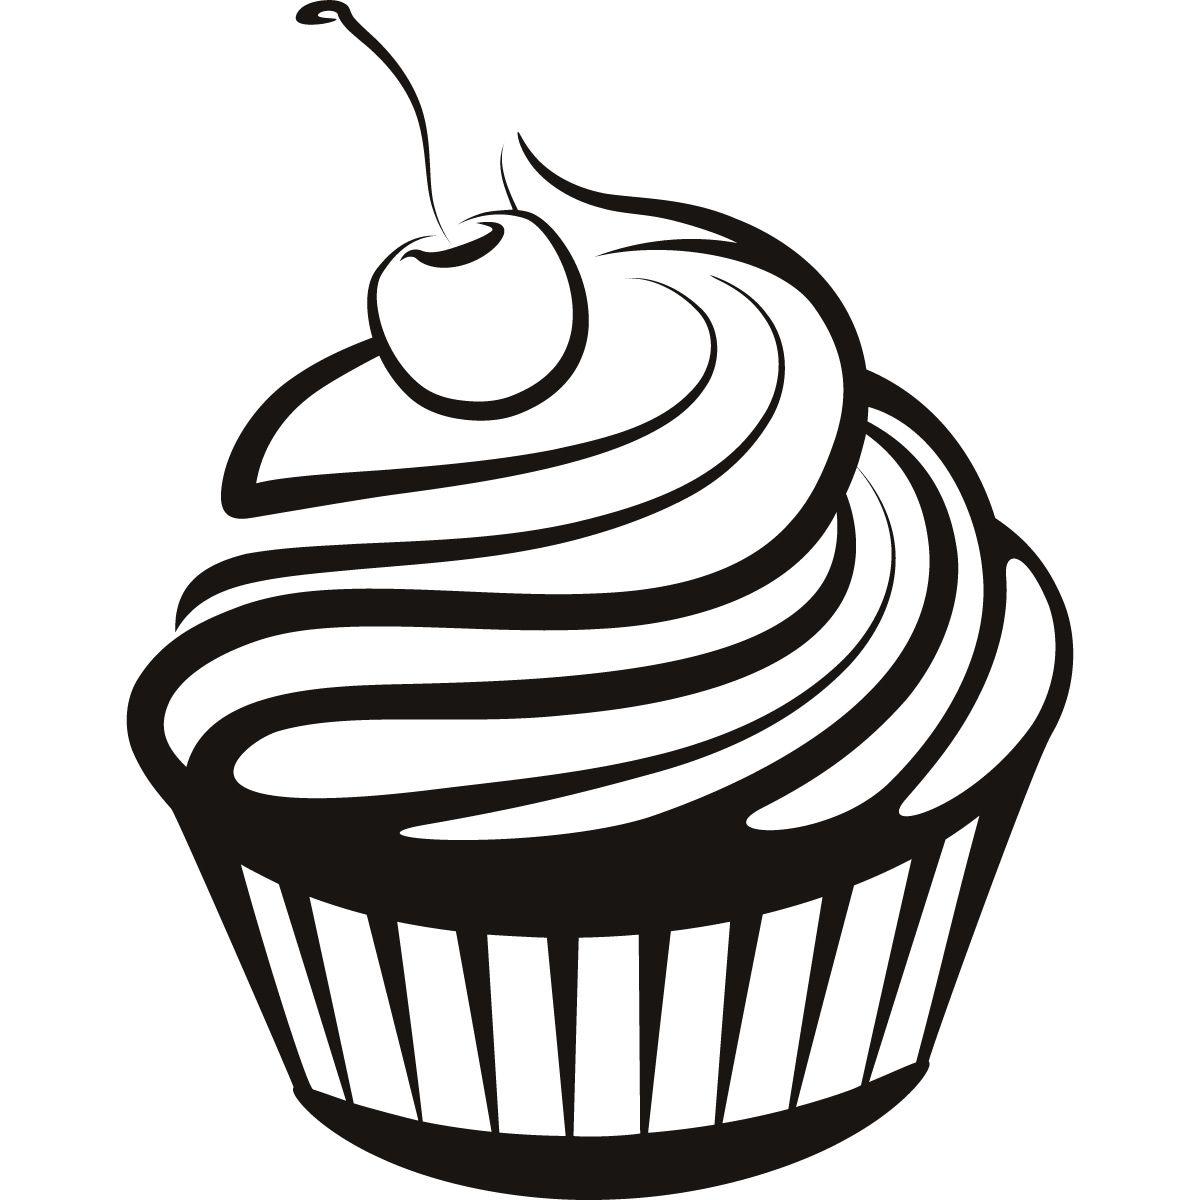 1200x1200 black and white cupcake drawing simple cupcake drawings cupcake